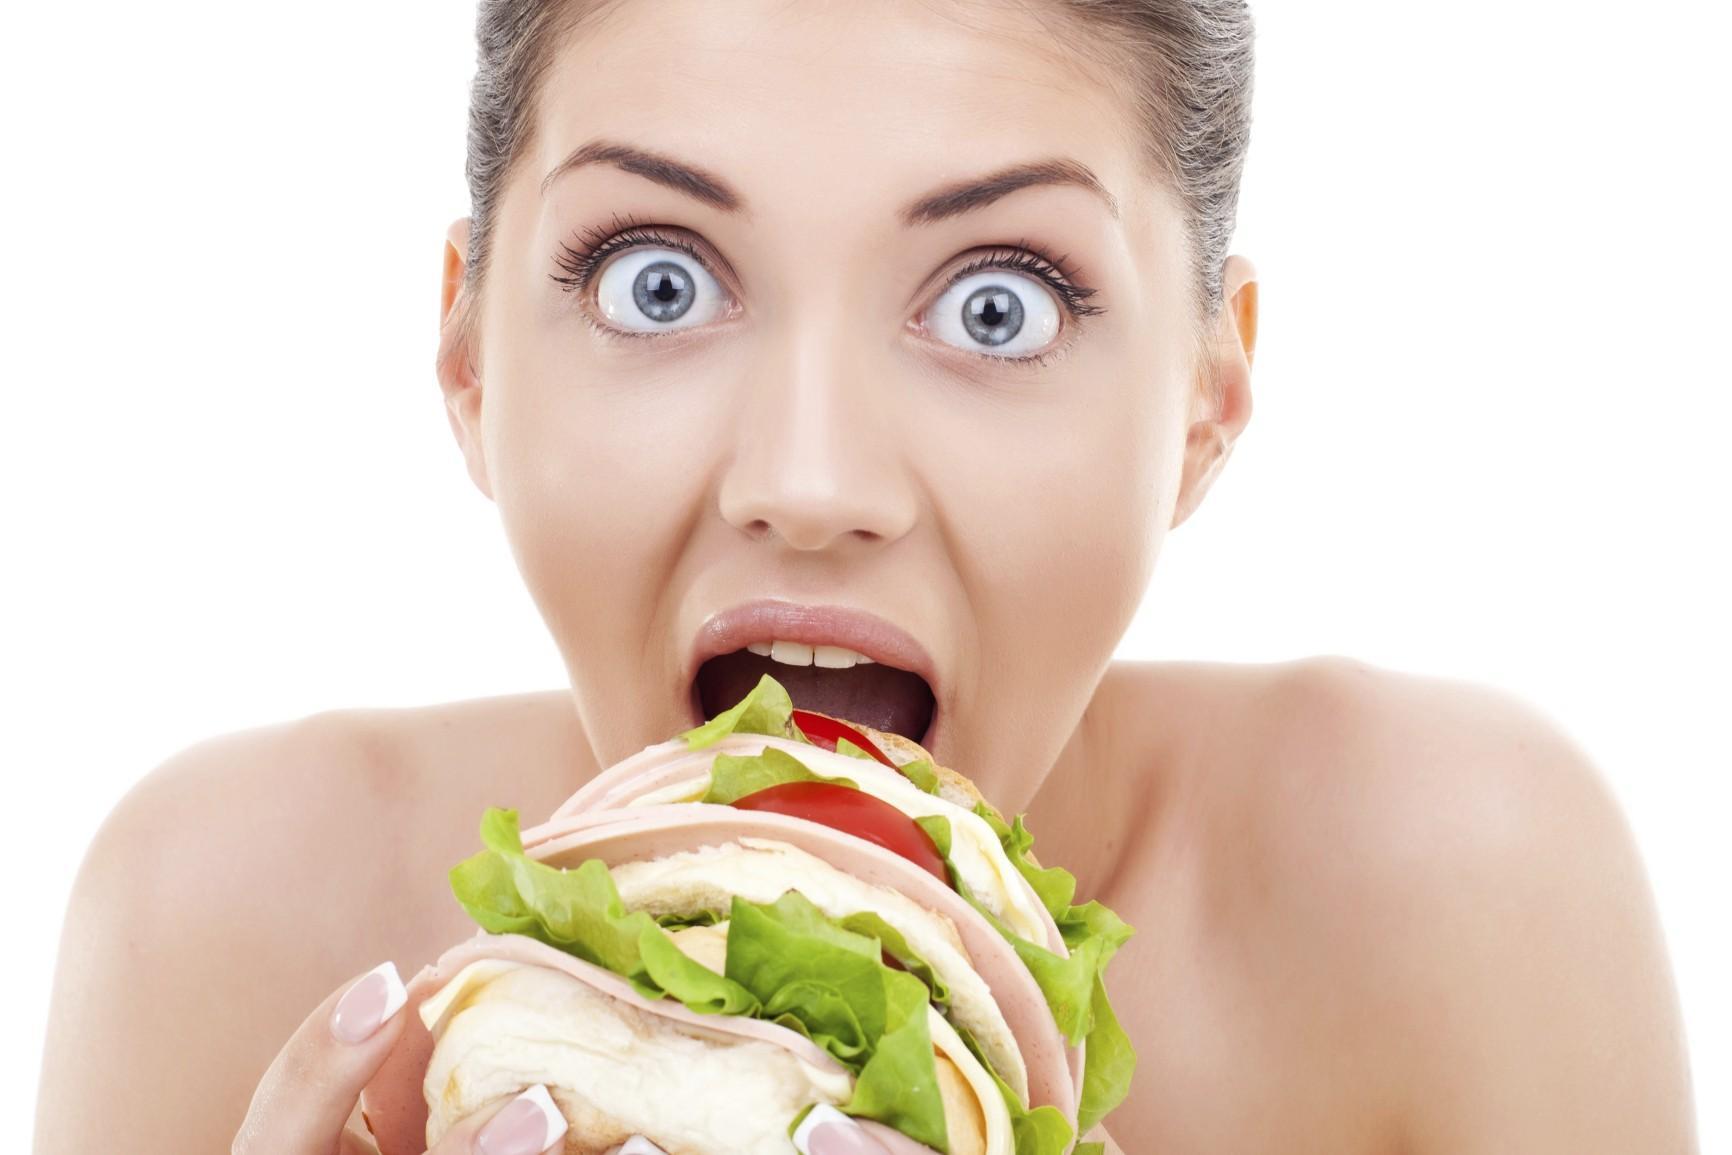 fame nervosa come affrontarla